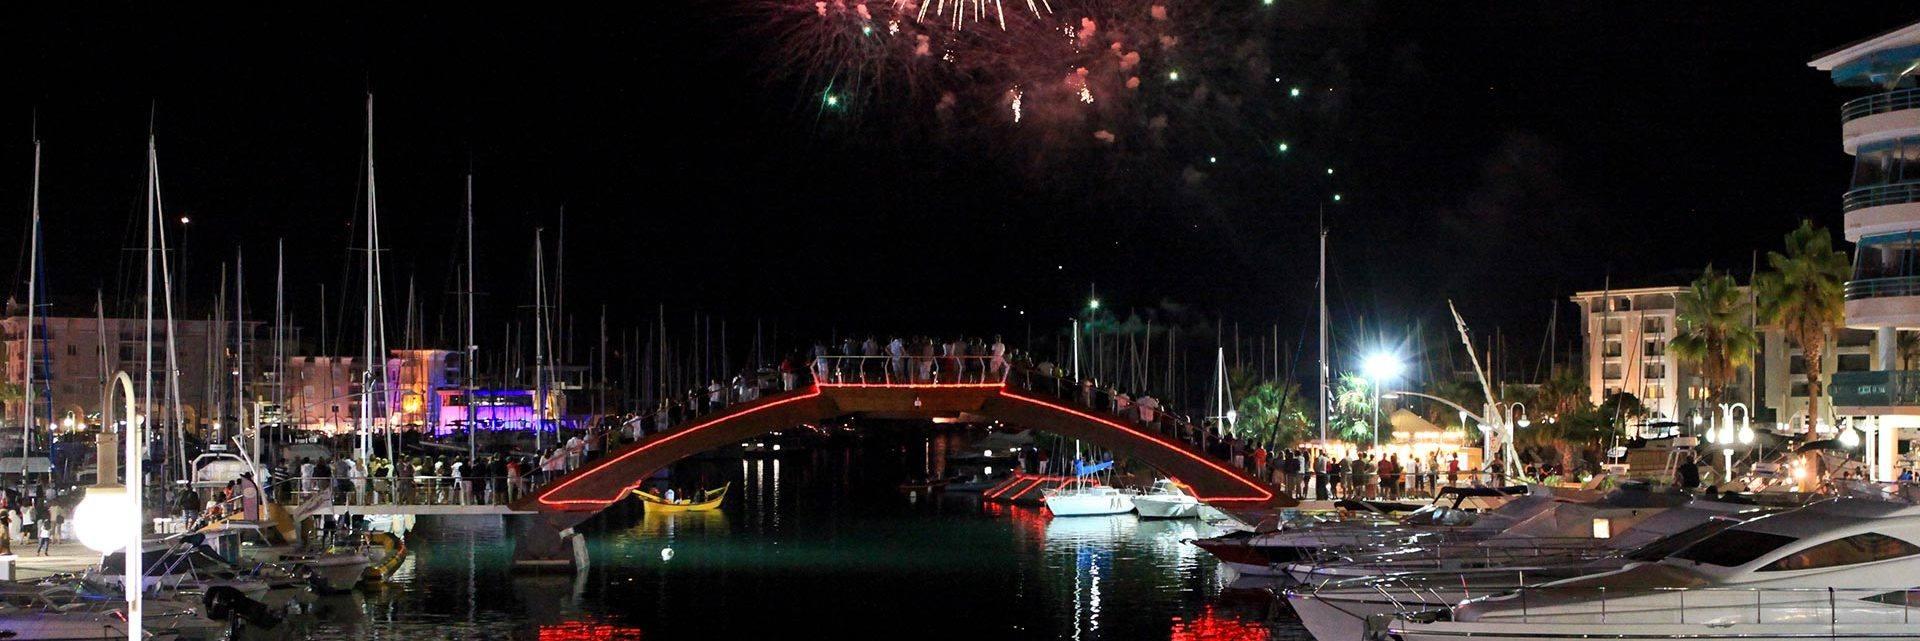 Fireworks in Fréjus Port